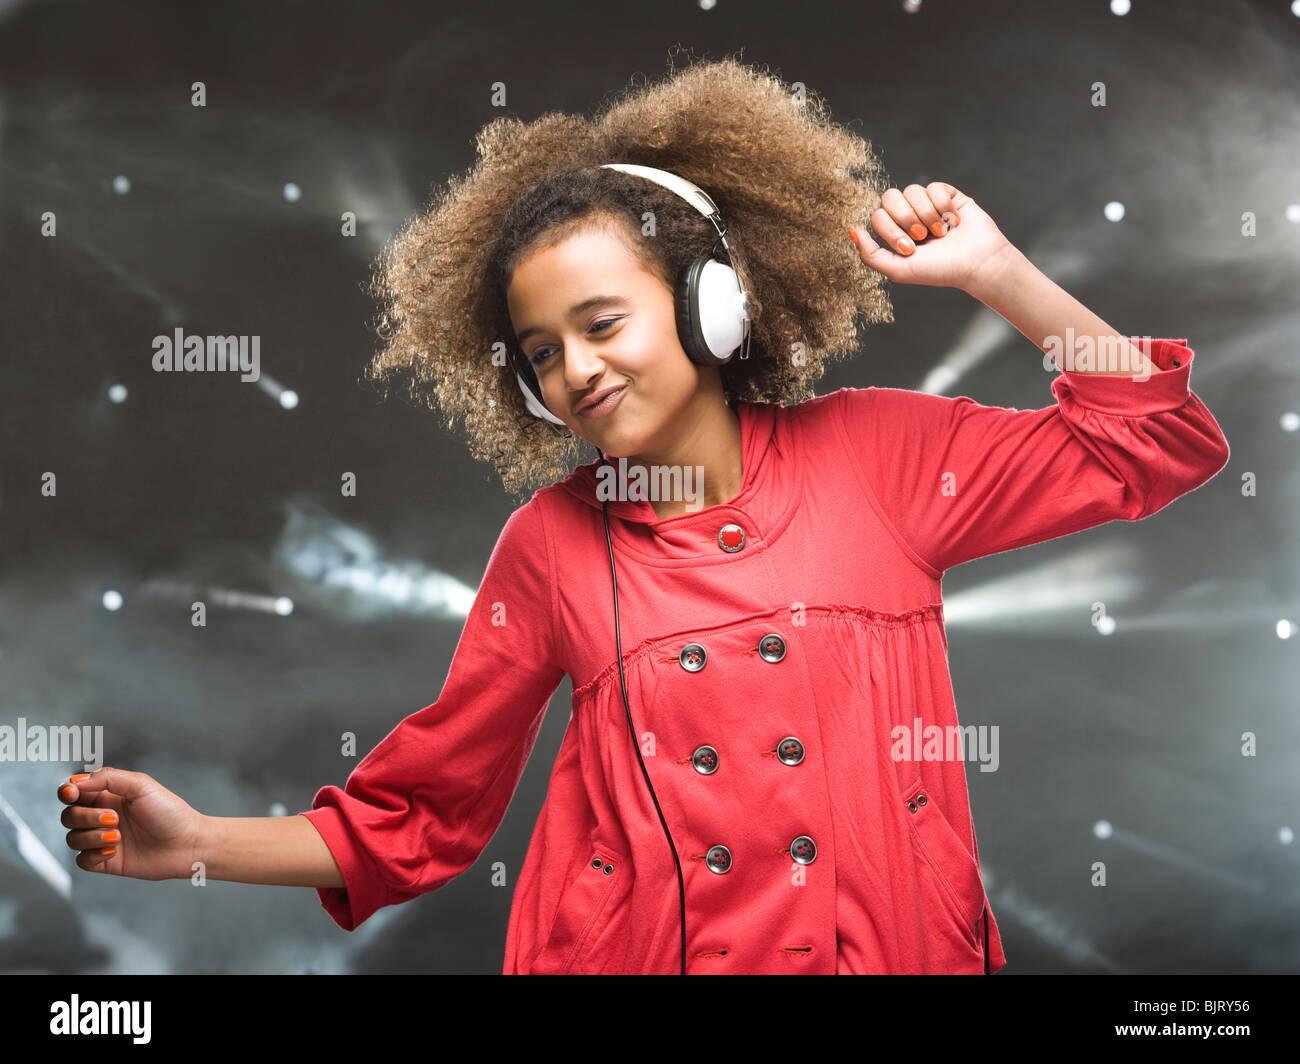 Girl (12-13) Dancing with headphones Photo Stock